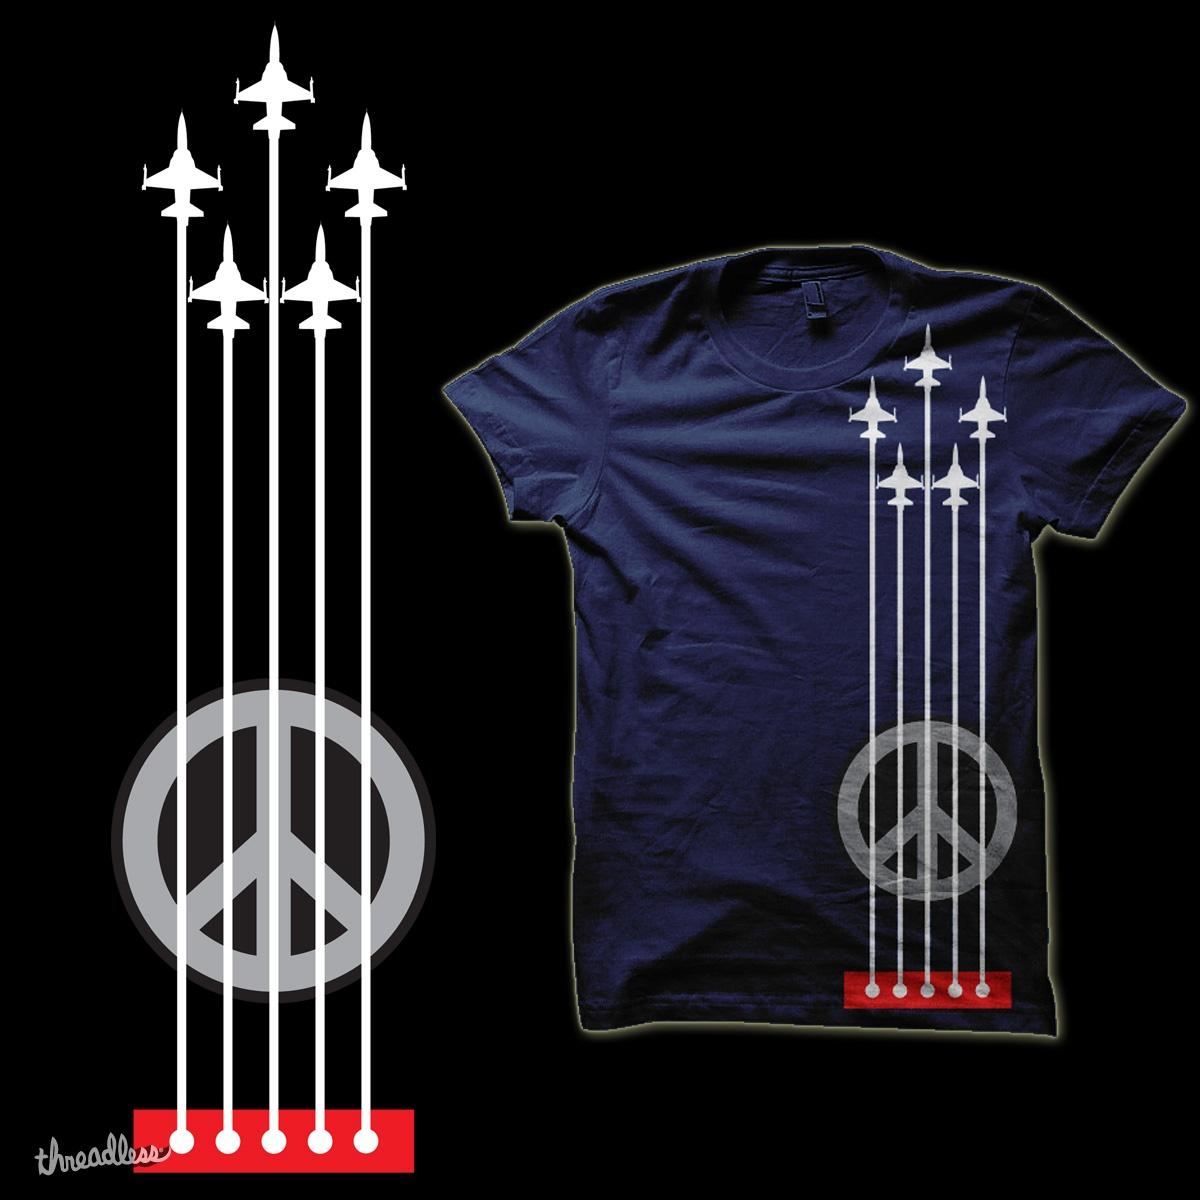 make music & peace not war  by jhun213 on Threadless